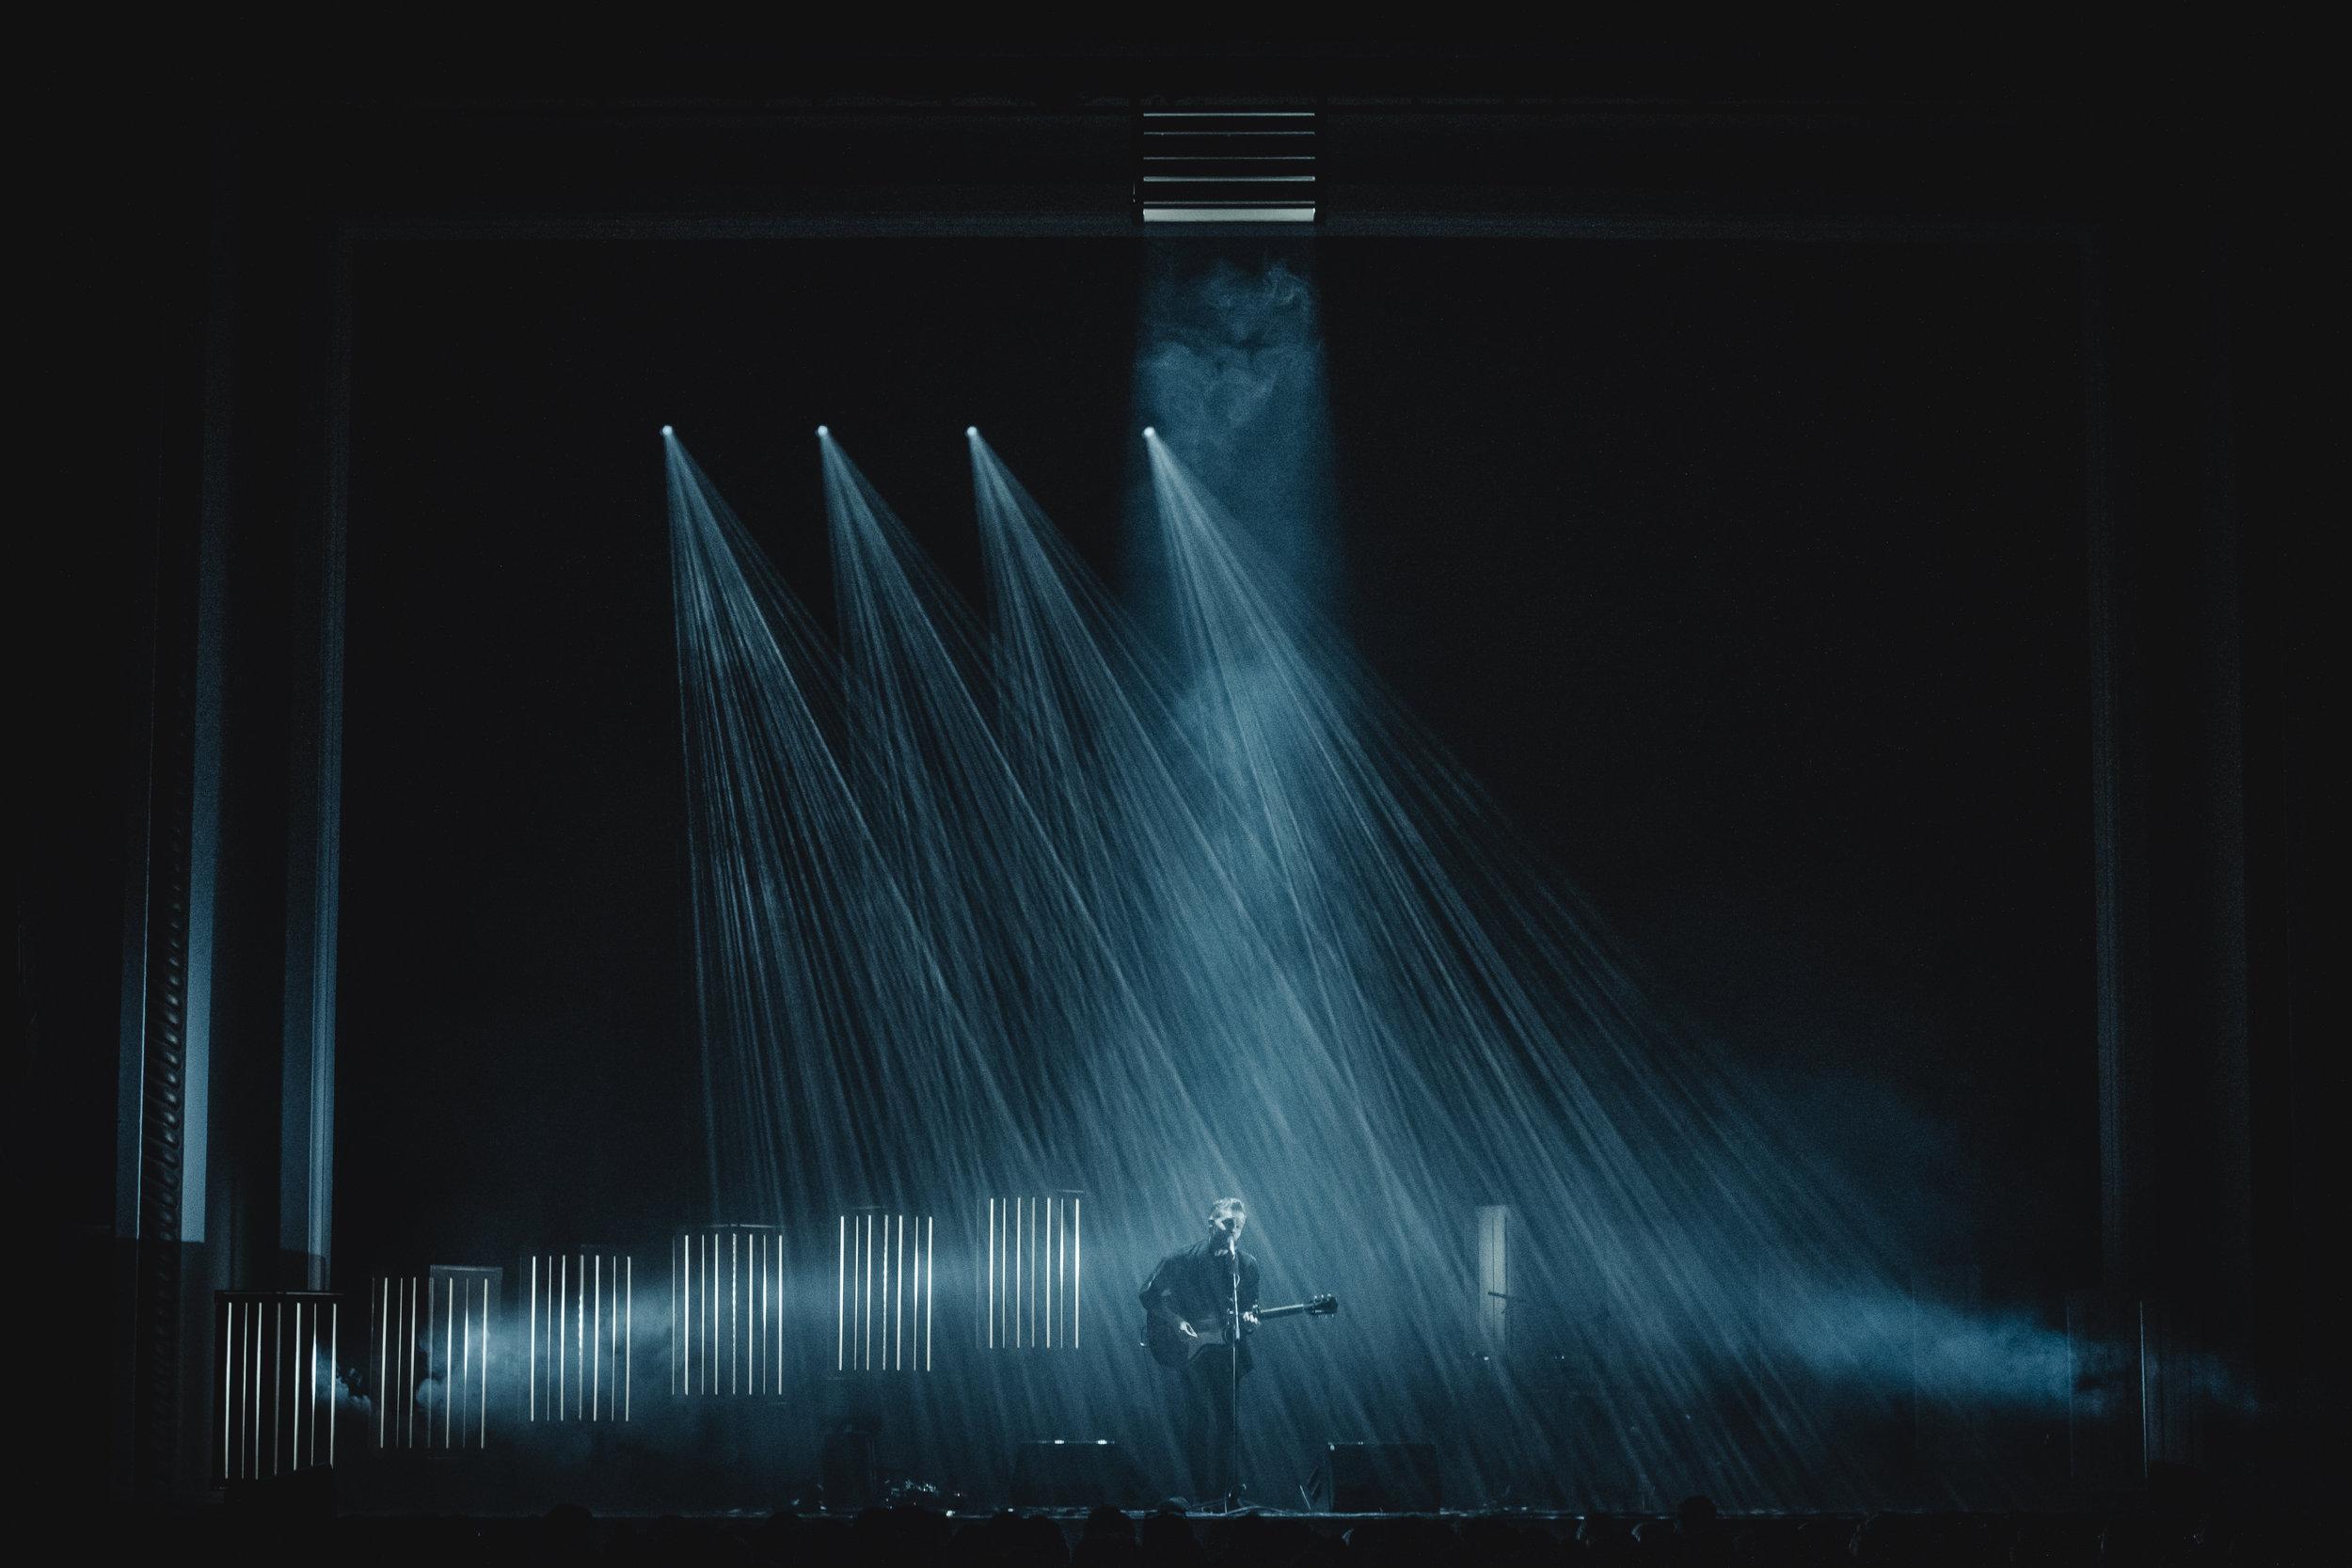 2018-09-27 - De Roma - The Tallest Man on Earth - 02 concert - 001.jpg